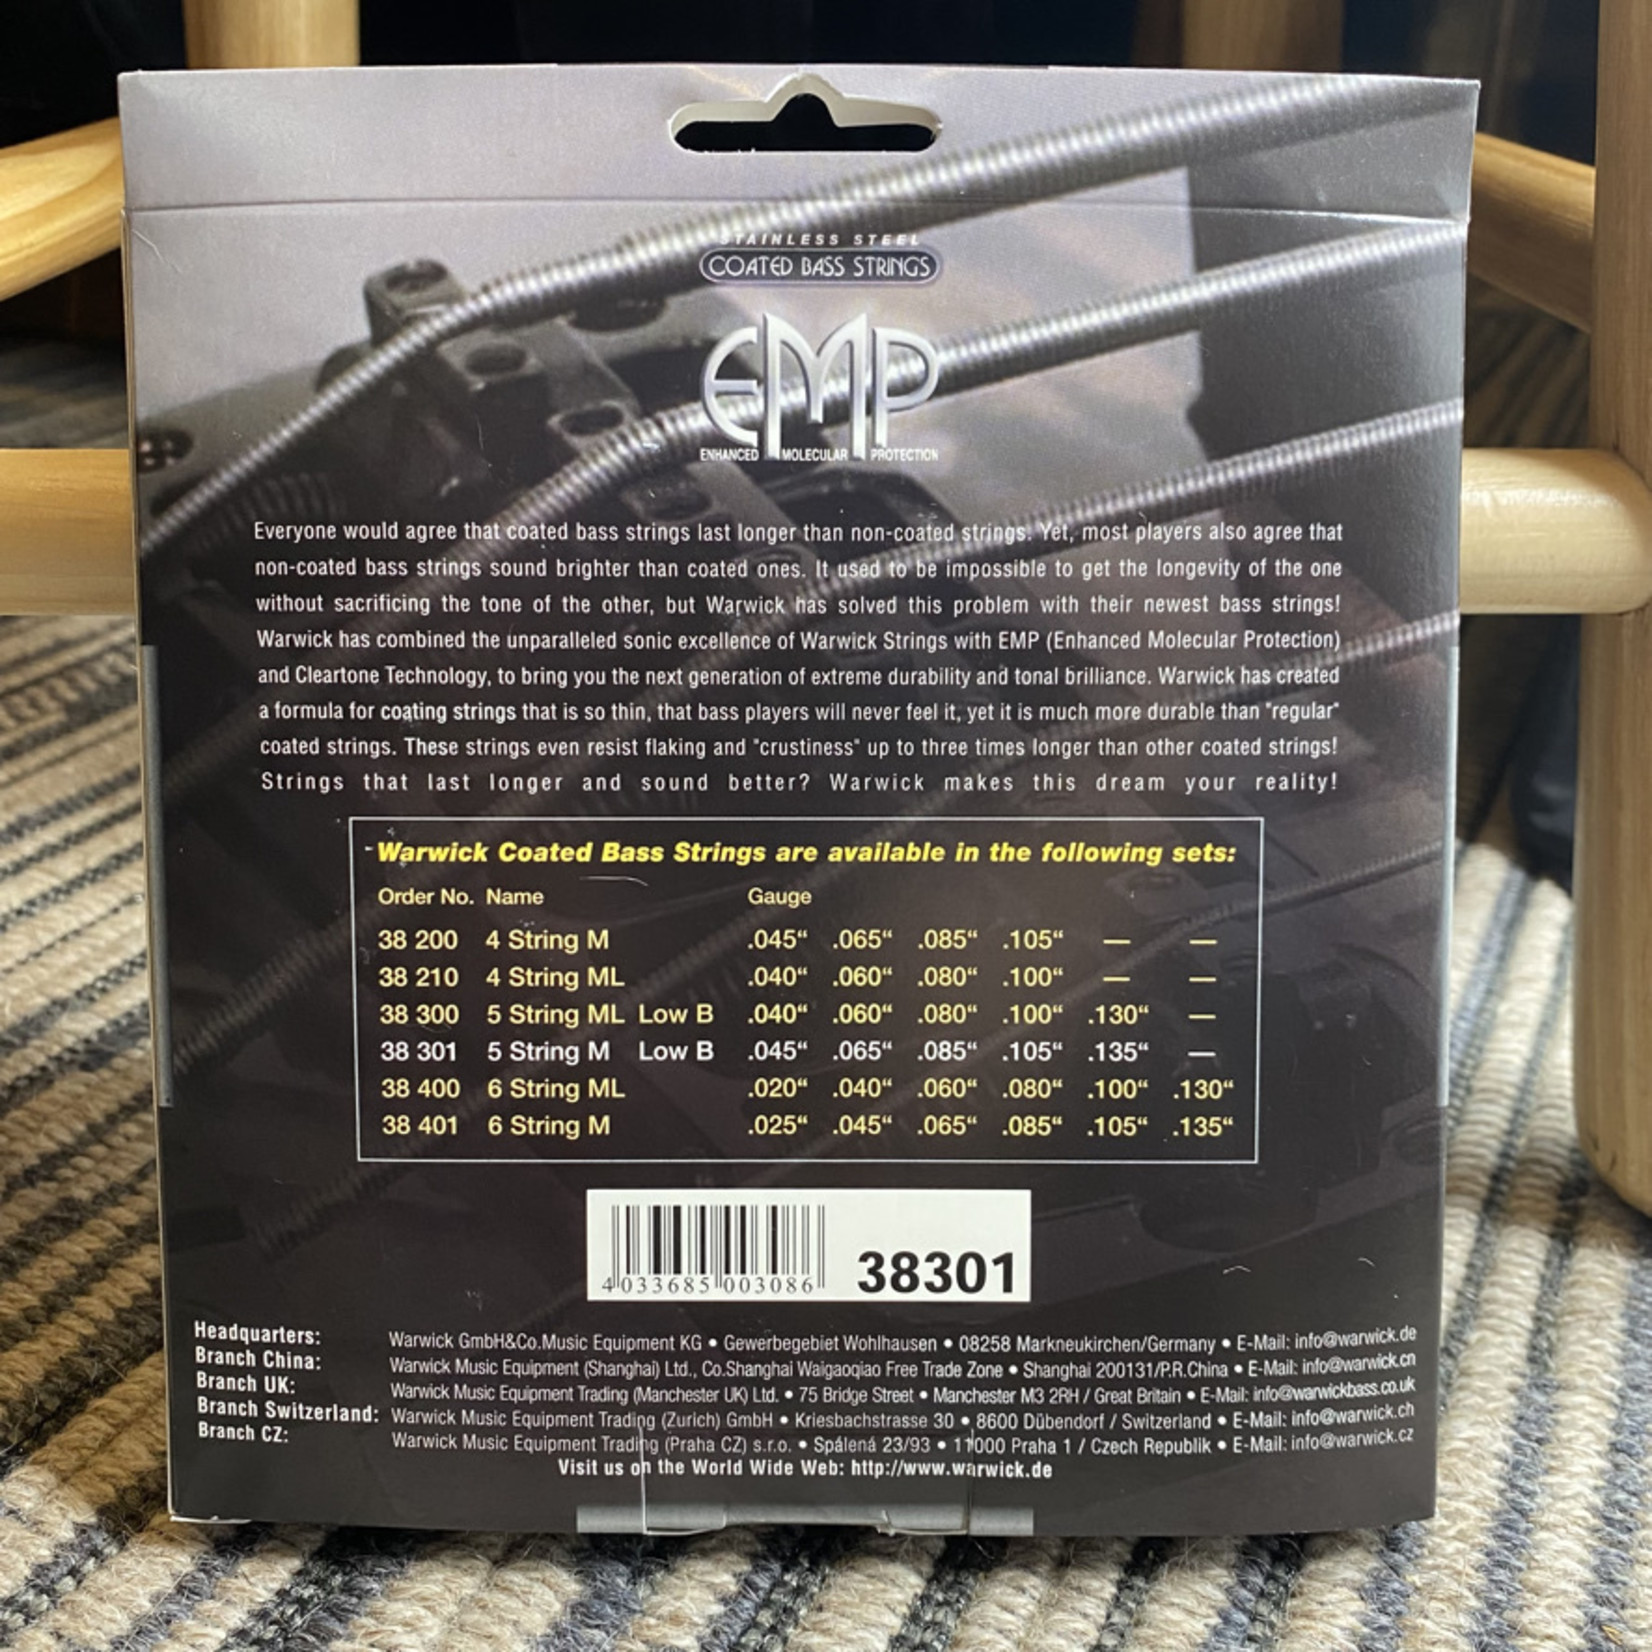 Warwick Warwick EMP Stainless Steel Coated - Bass String Set, 5-String, Medium, .045-.135 (38301 M 5B 045/135)